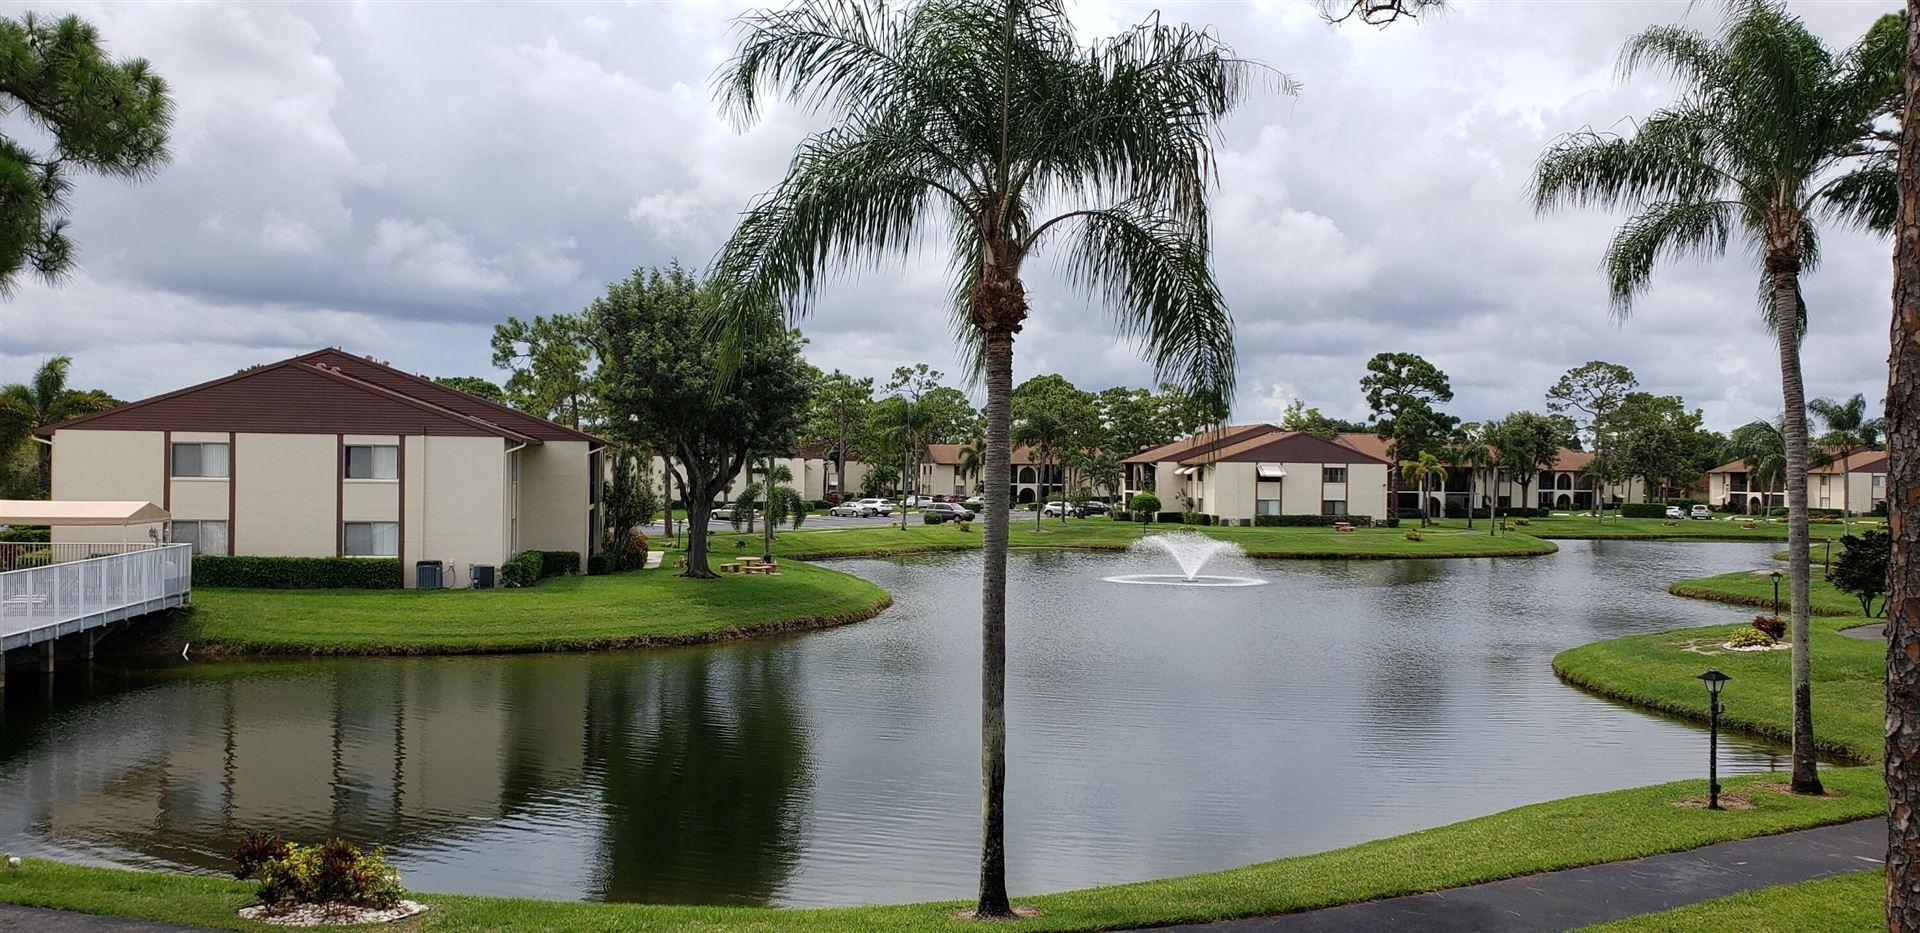 303 Knotty Pine Circle #C-2, Greenacres, FL 33463 - #: RX-10727942